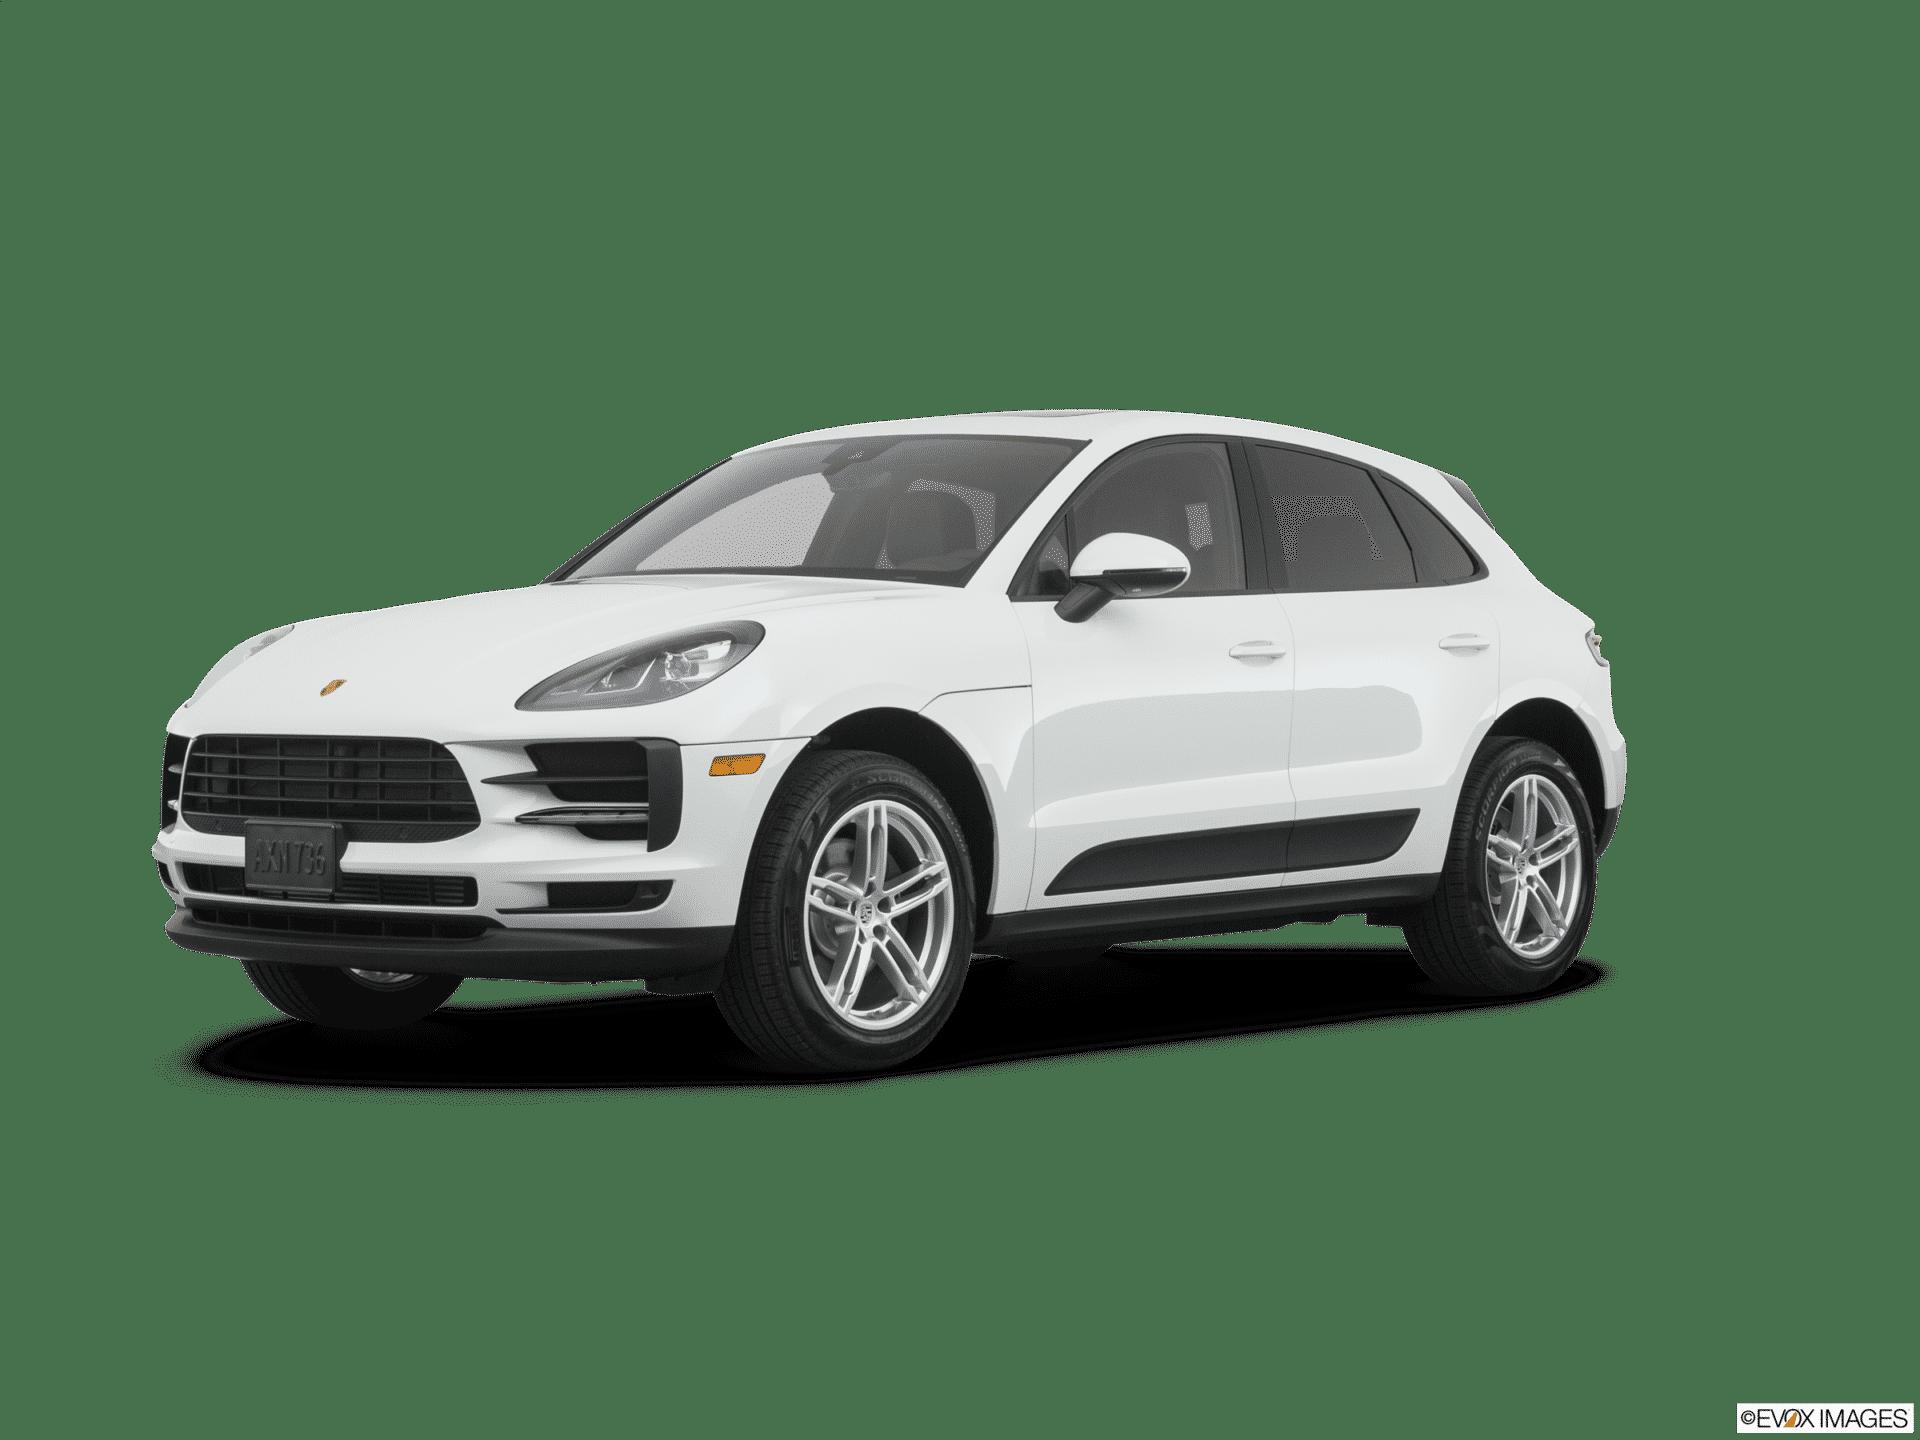 2019-Porsche-Macan-360SpinFrame_13726_032_2400x1800